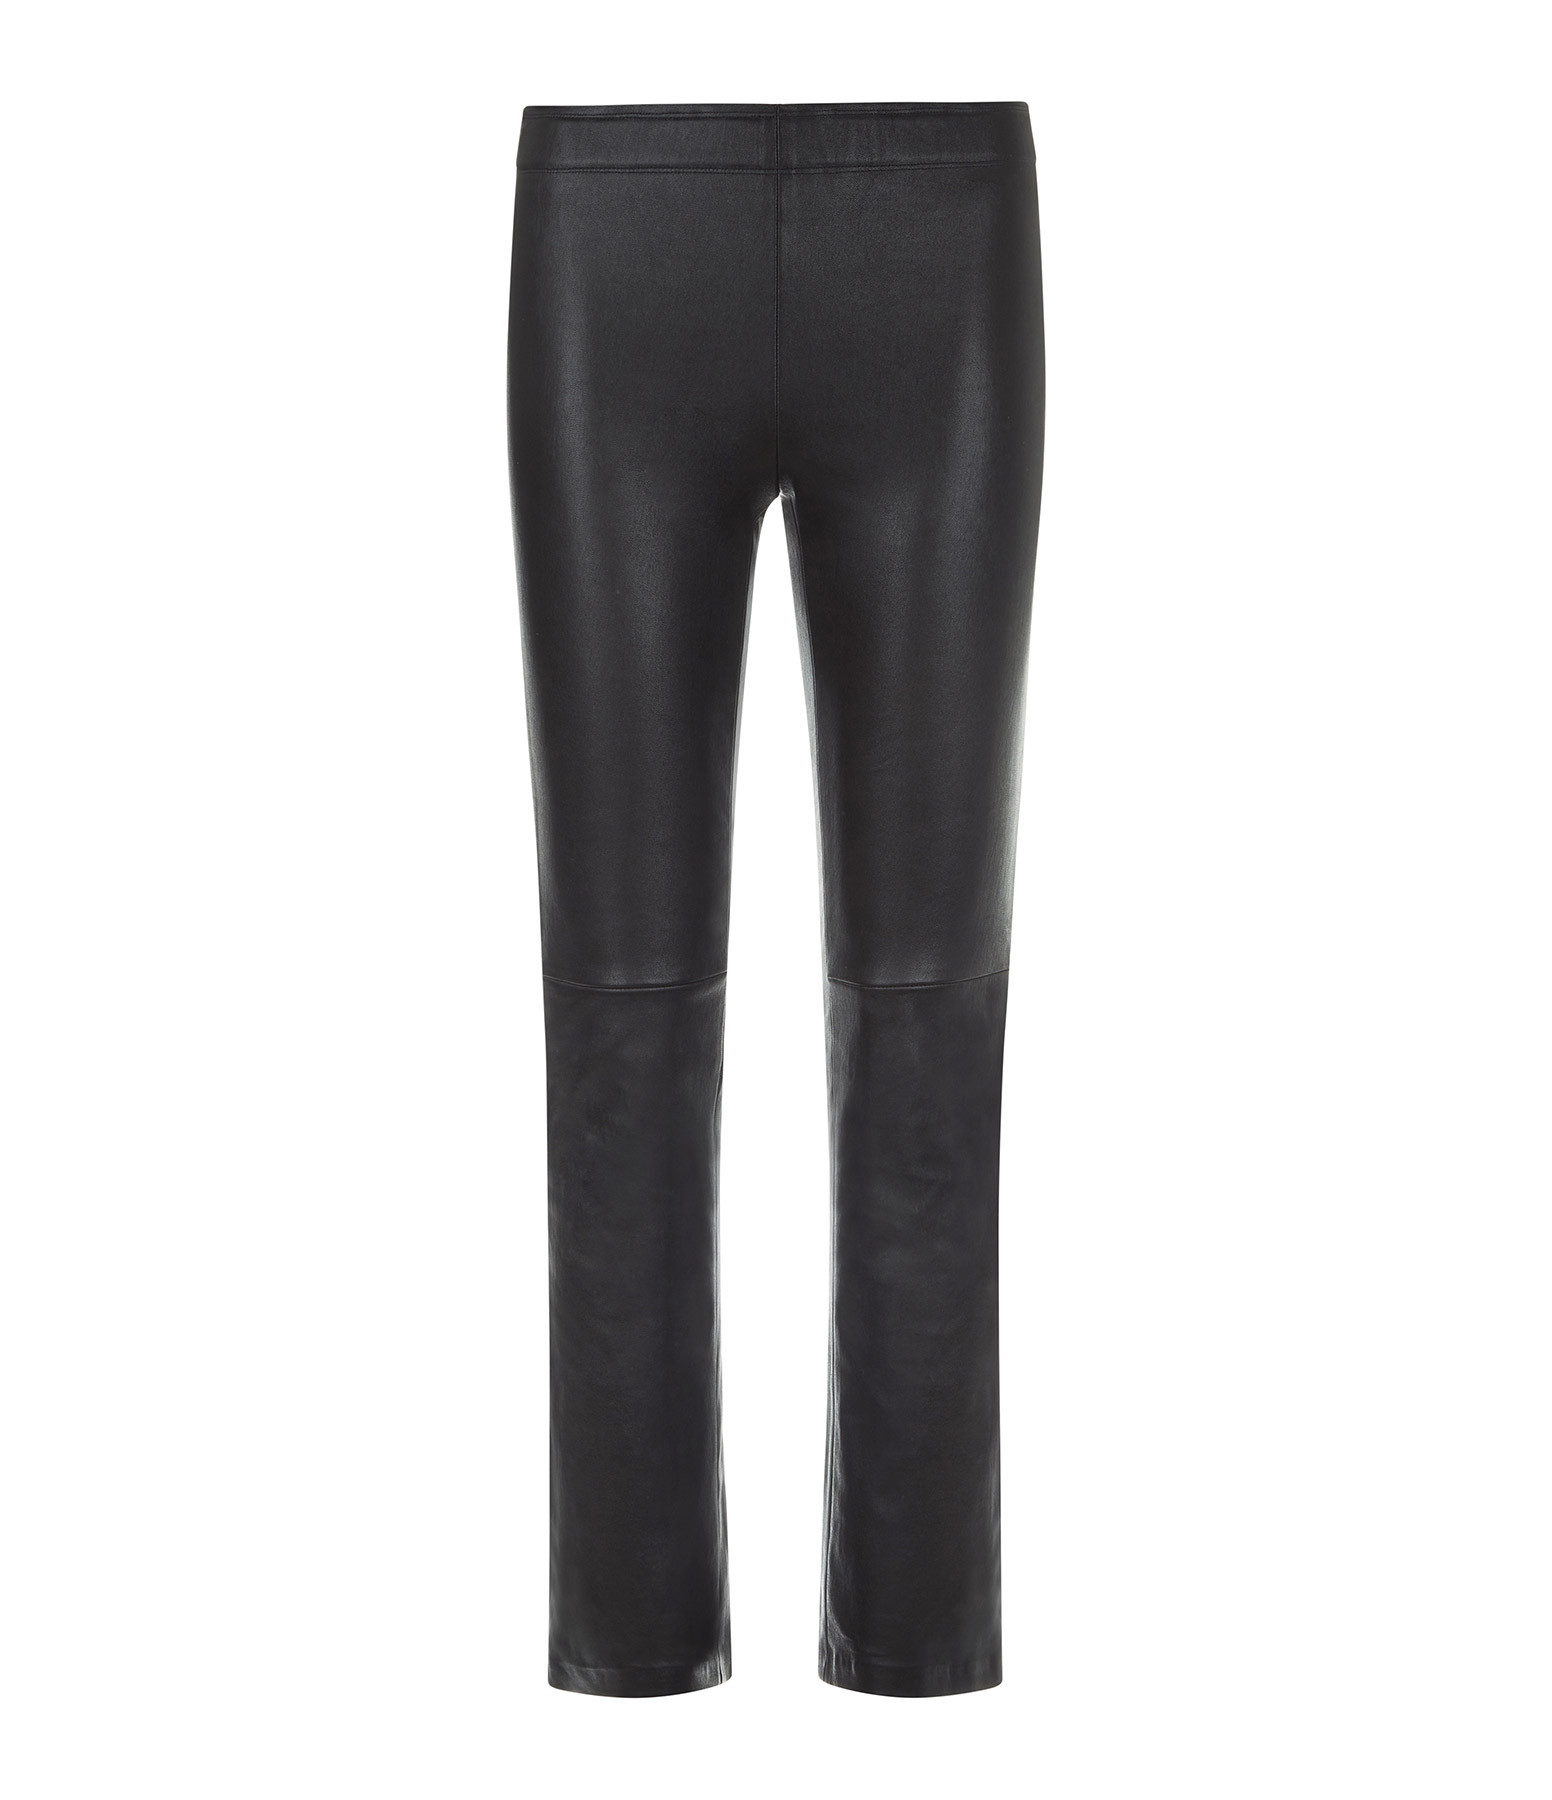 STOULS - Pantalon JP Twenty Agneau Plongé Regular Noir